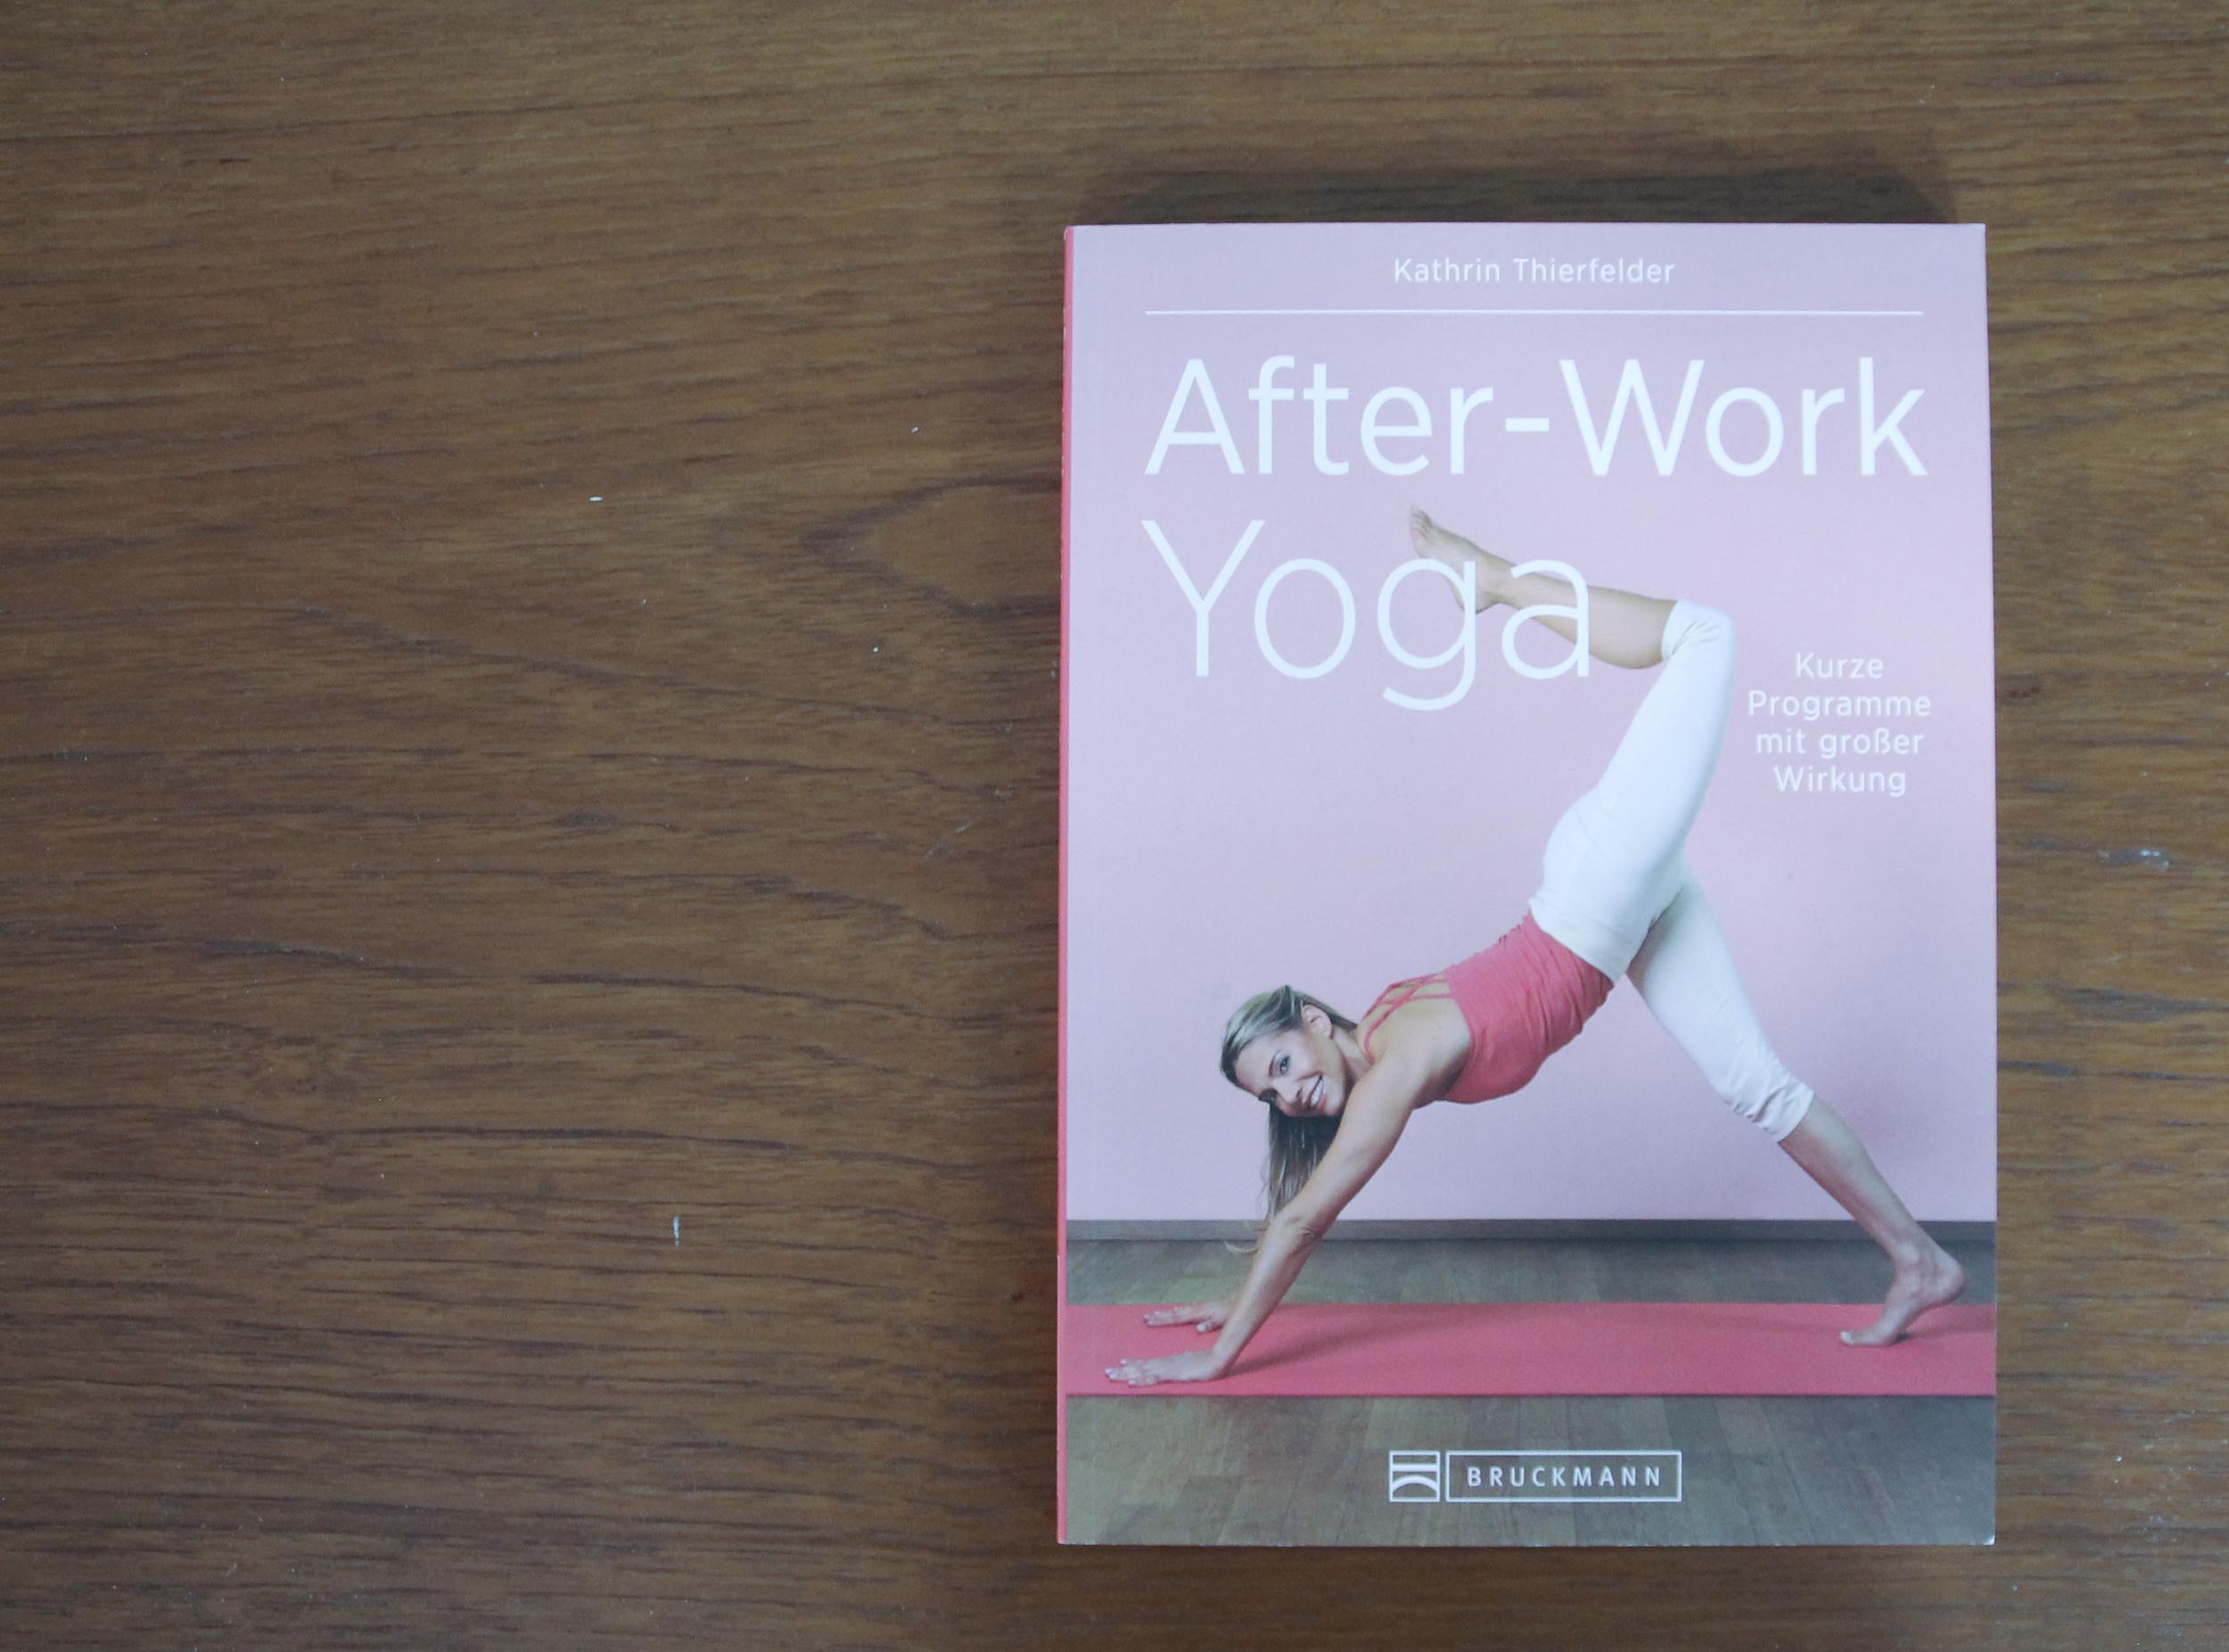 yoga after work3925.jpg